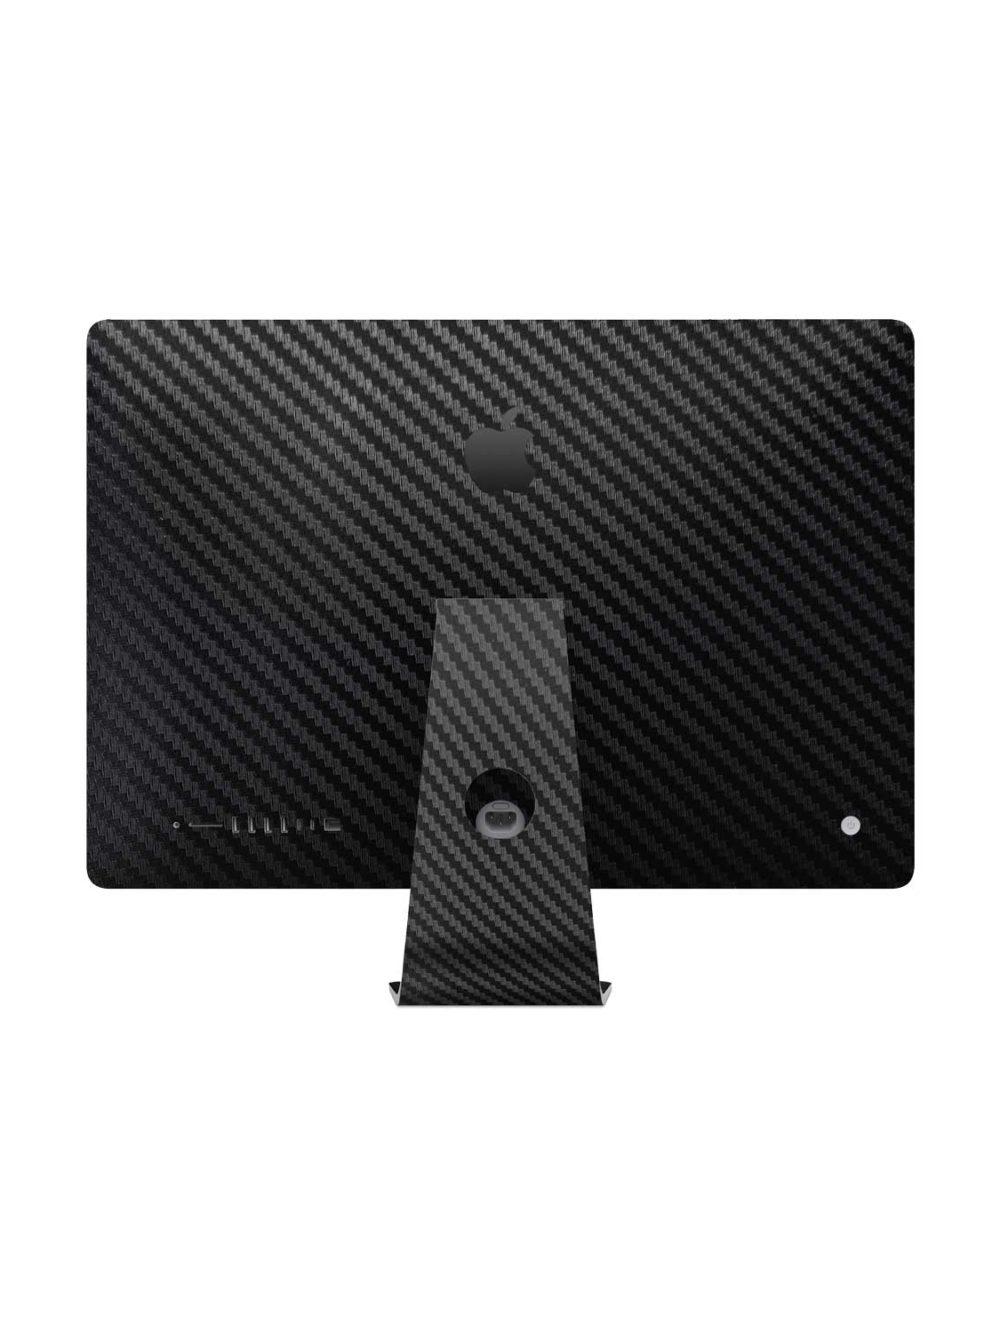 3D Textured Black Carbon Fibre Skin for Apple iMac 27-inch